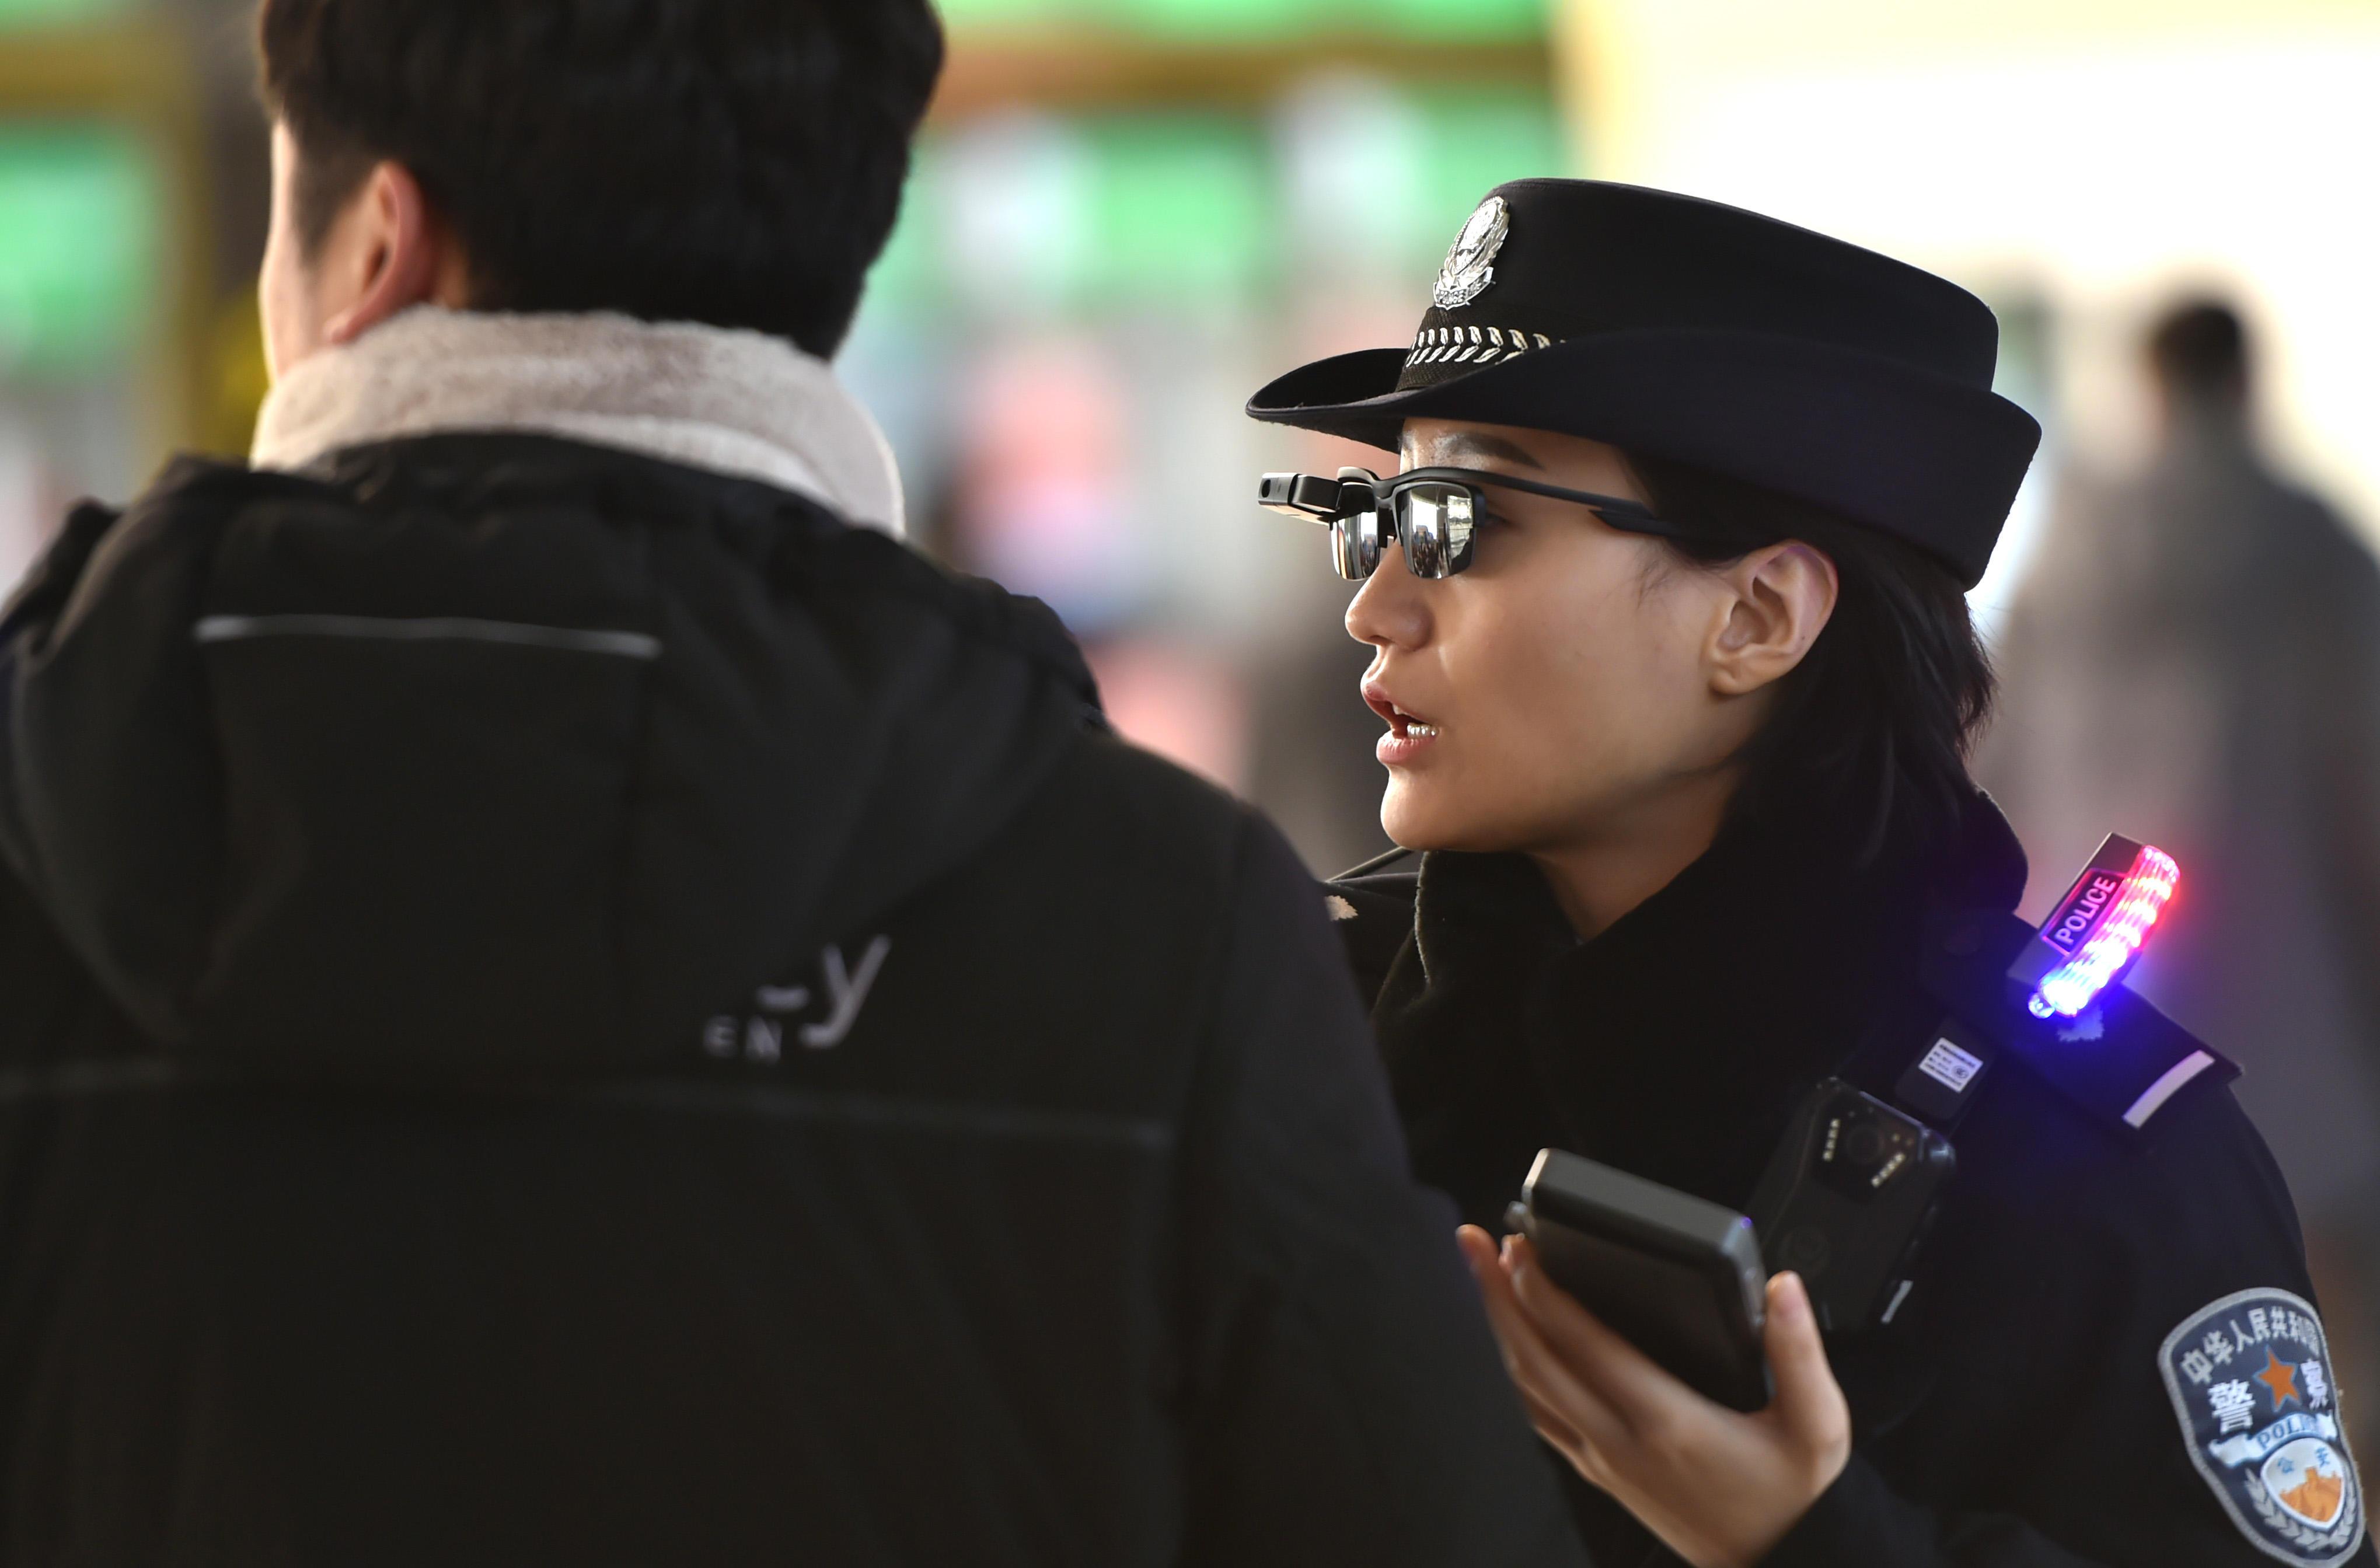 Crypto-betting in China